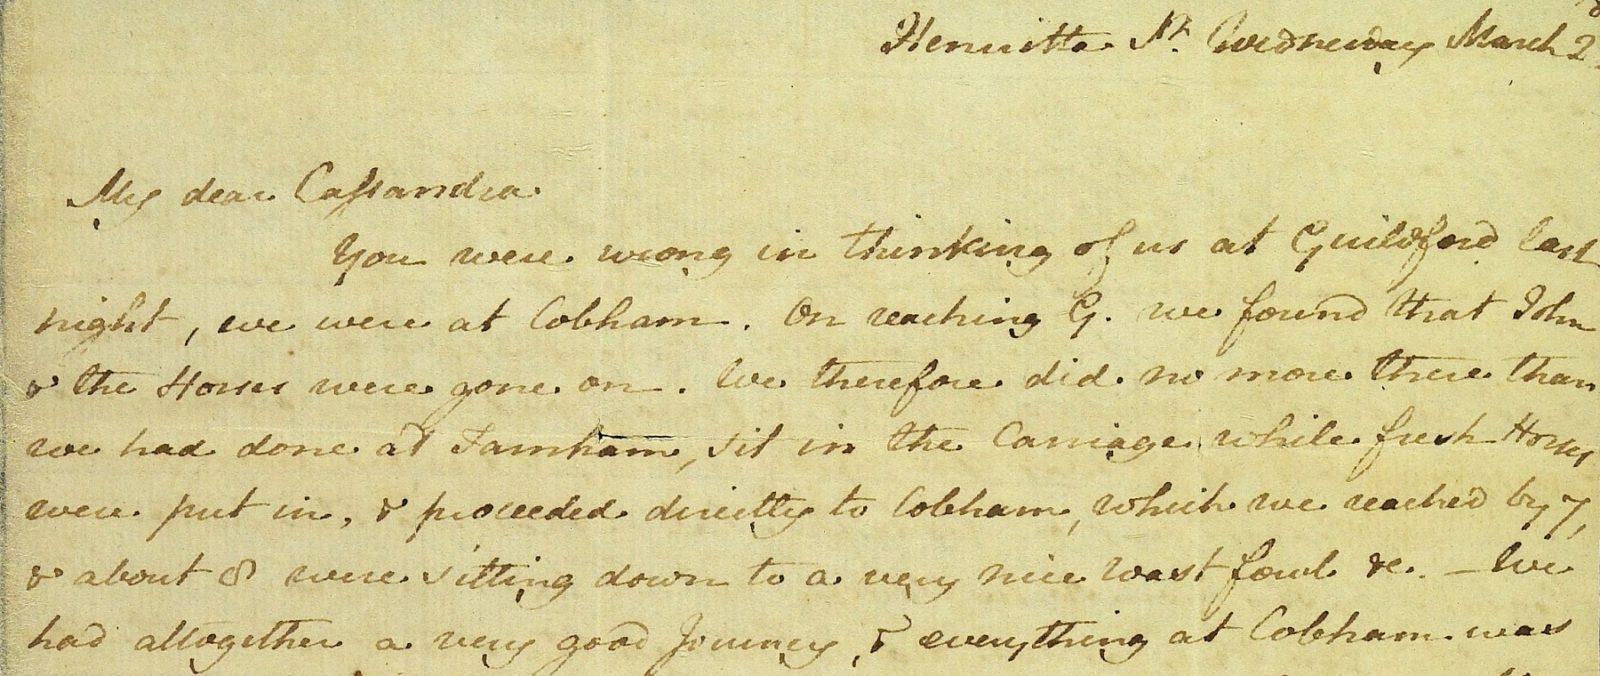 Close up of letter from Jane Austen to Cassandra Austen, 2 March 1814